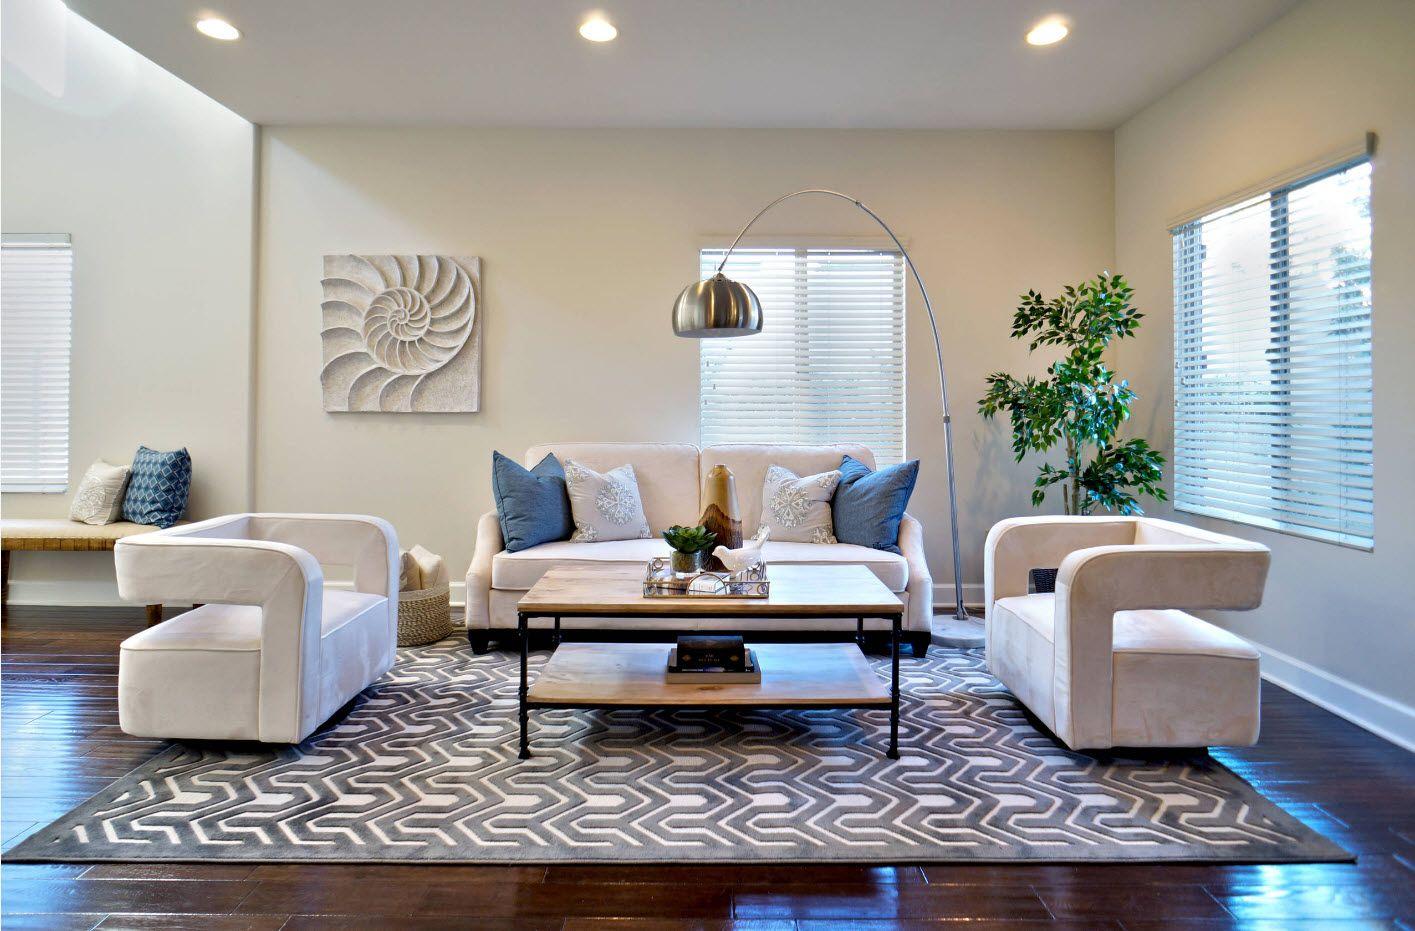 Cintemporary urban style for modern spacious living